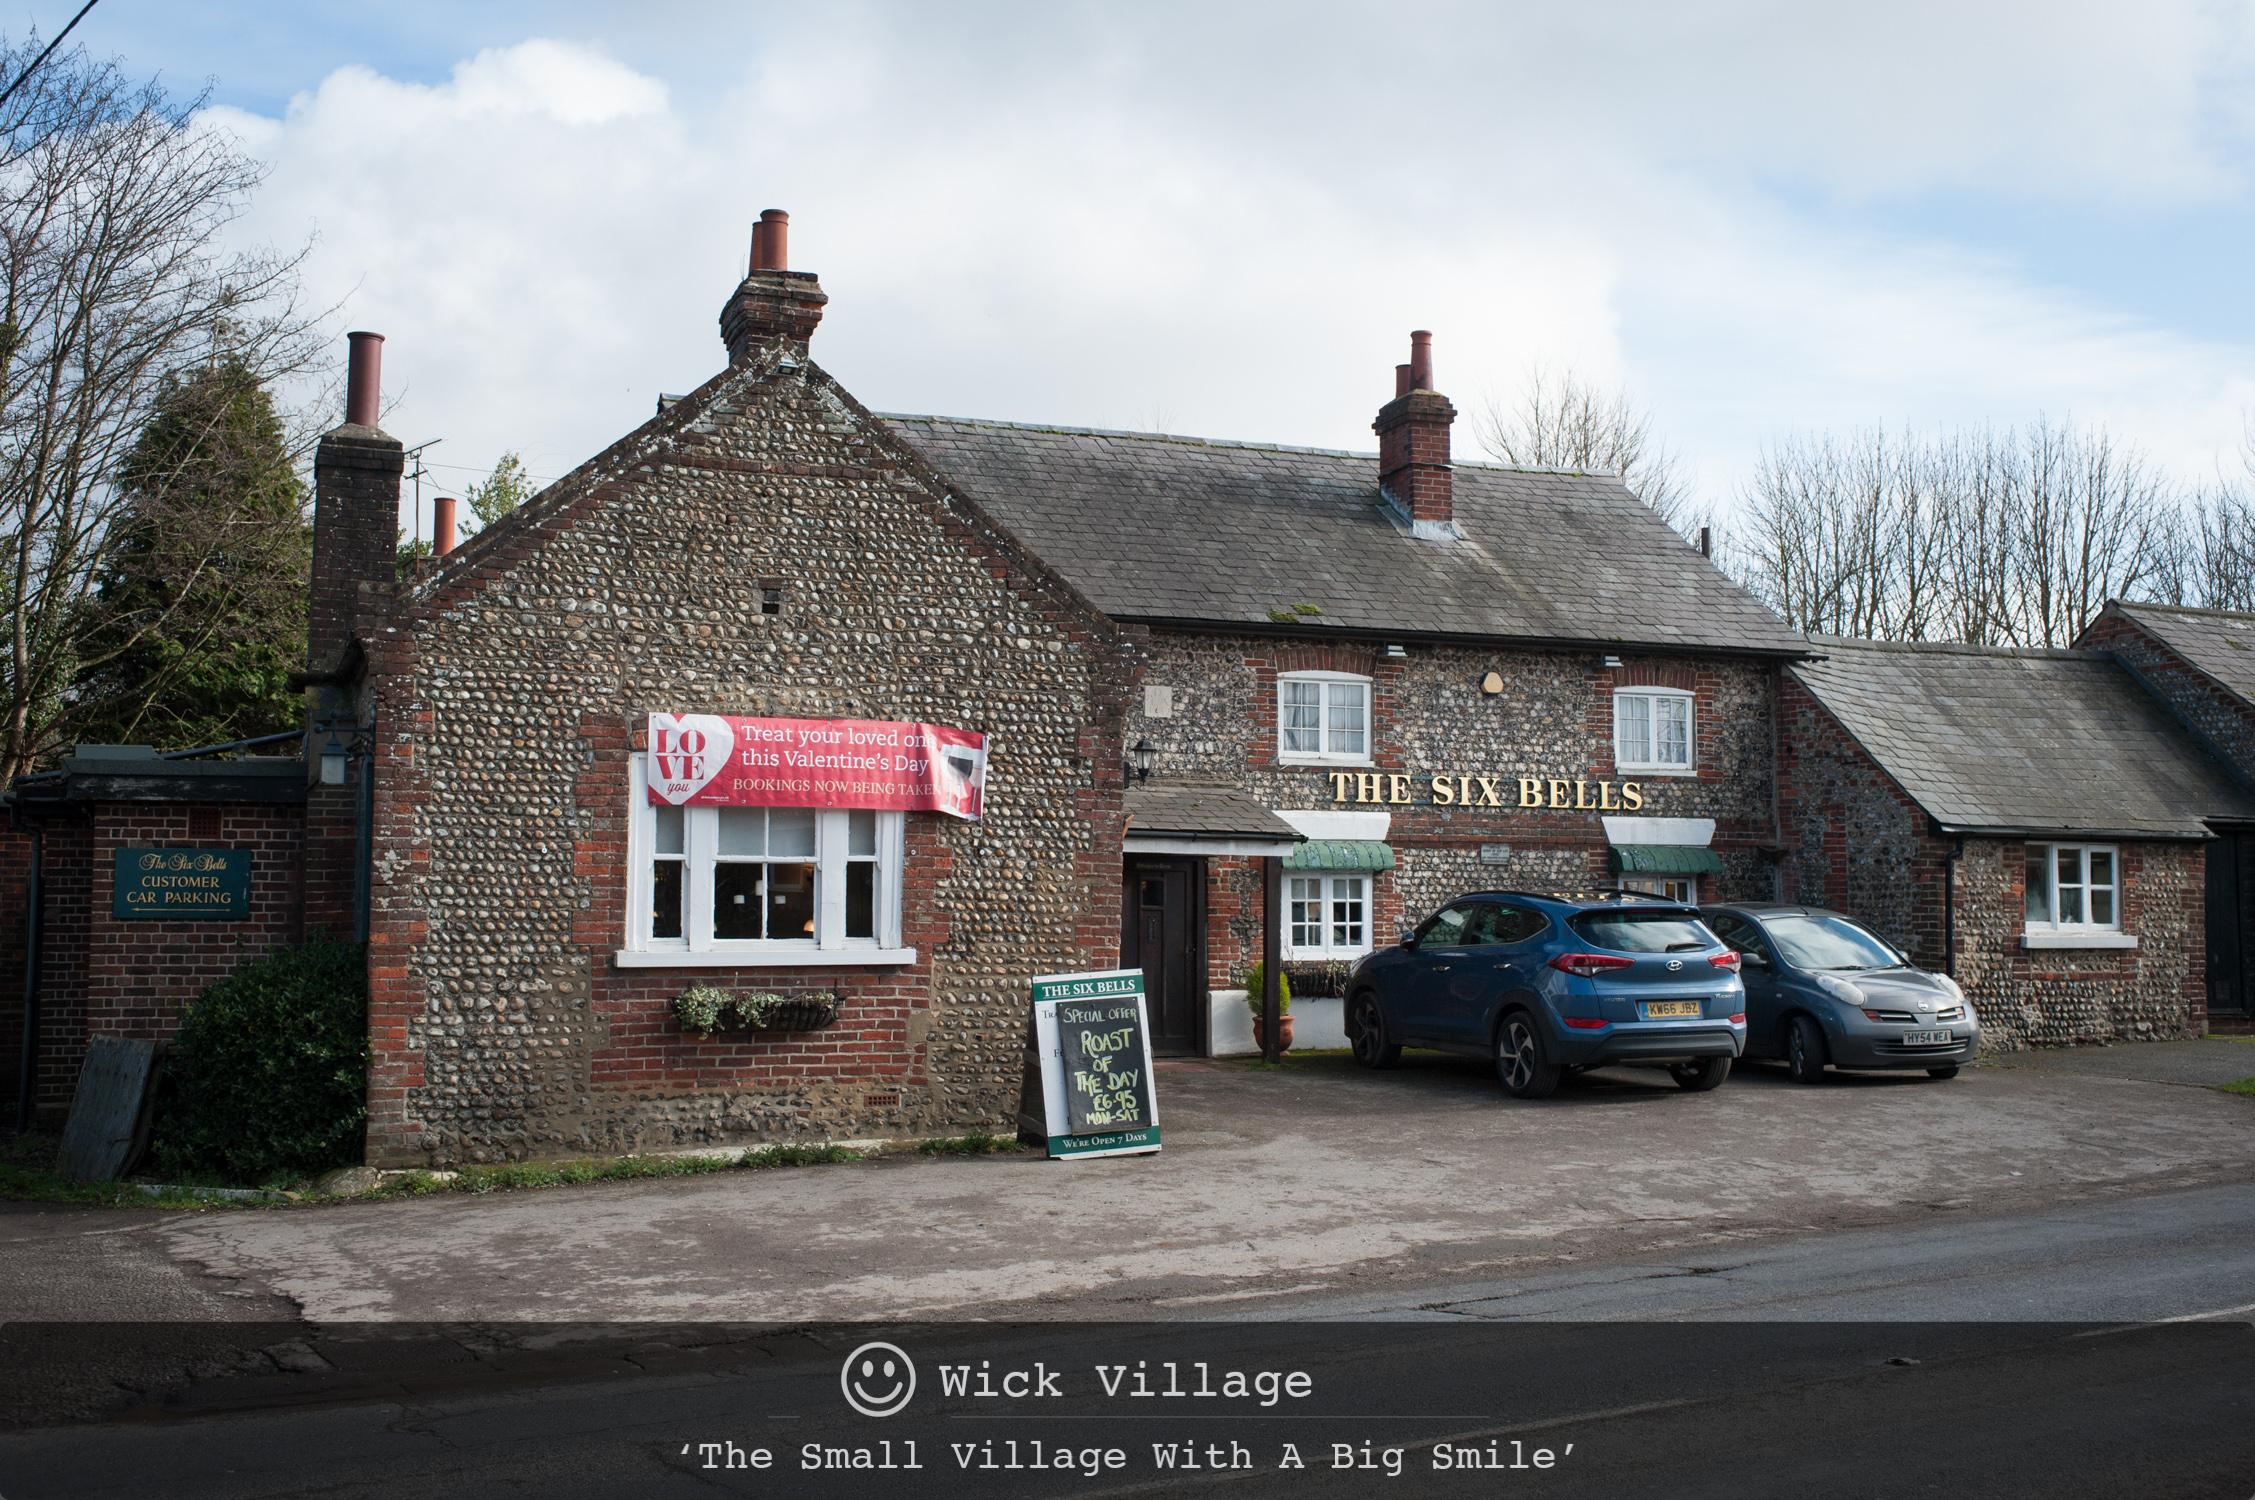 The Six Bells, Wick Village, Littlehampton.